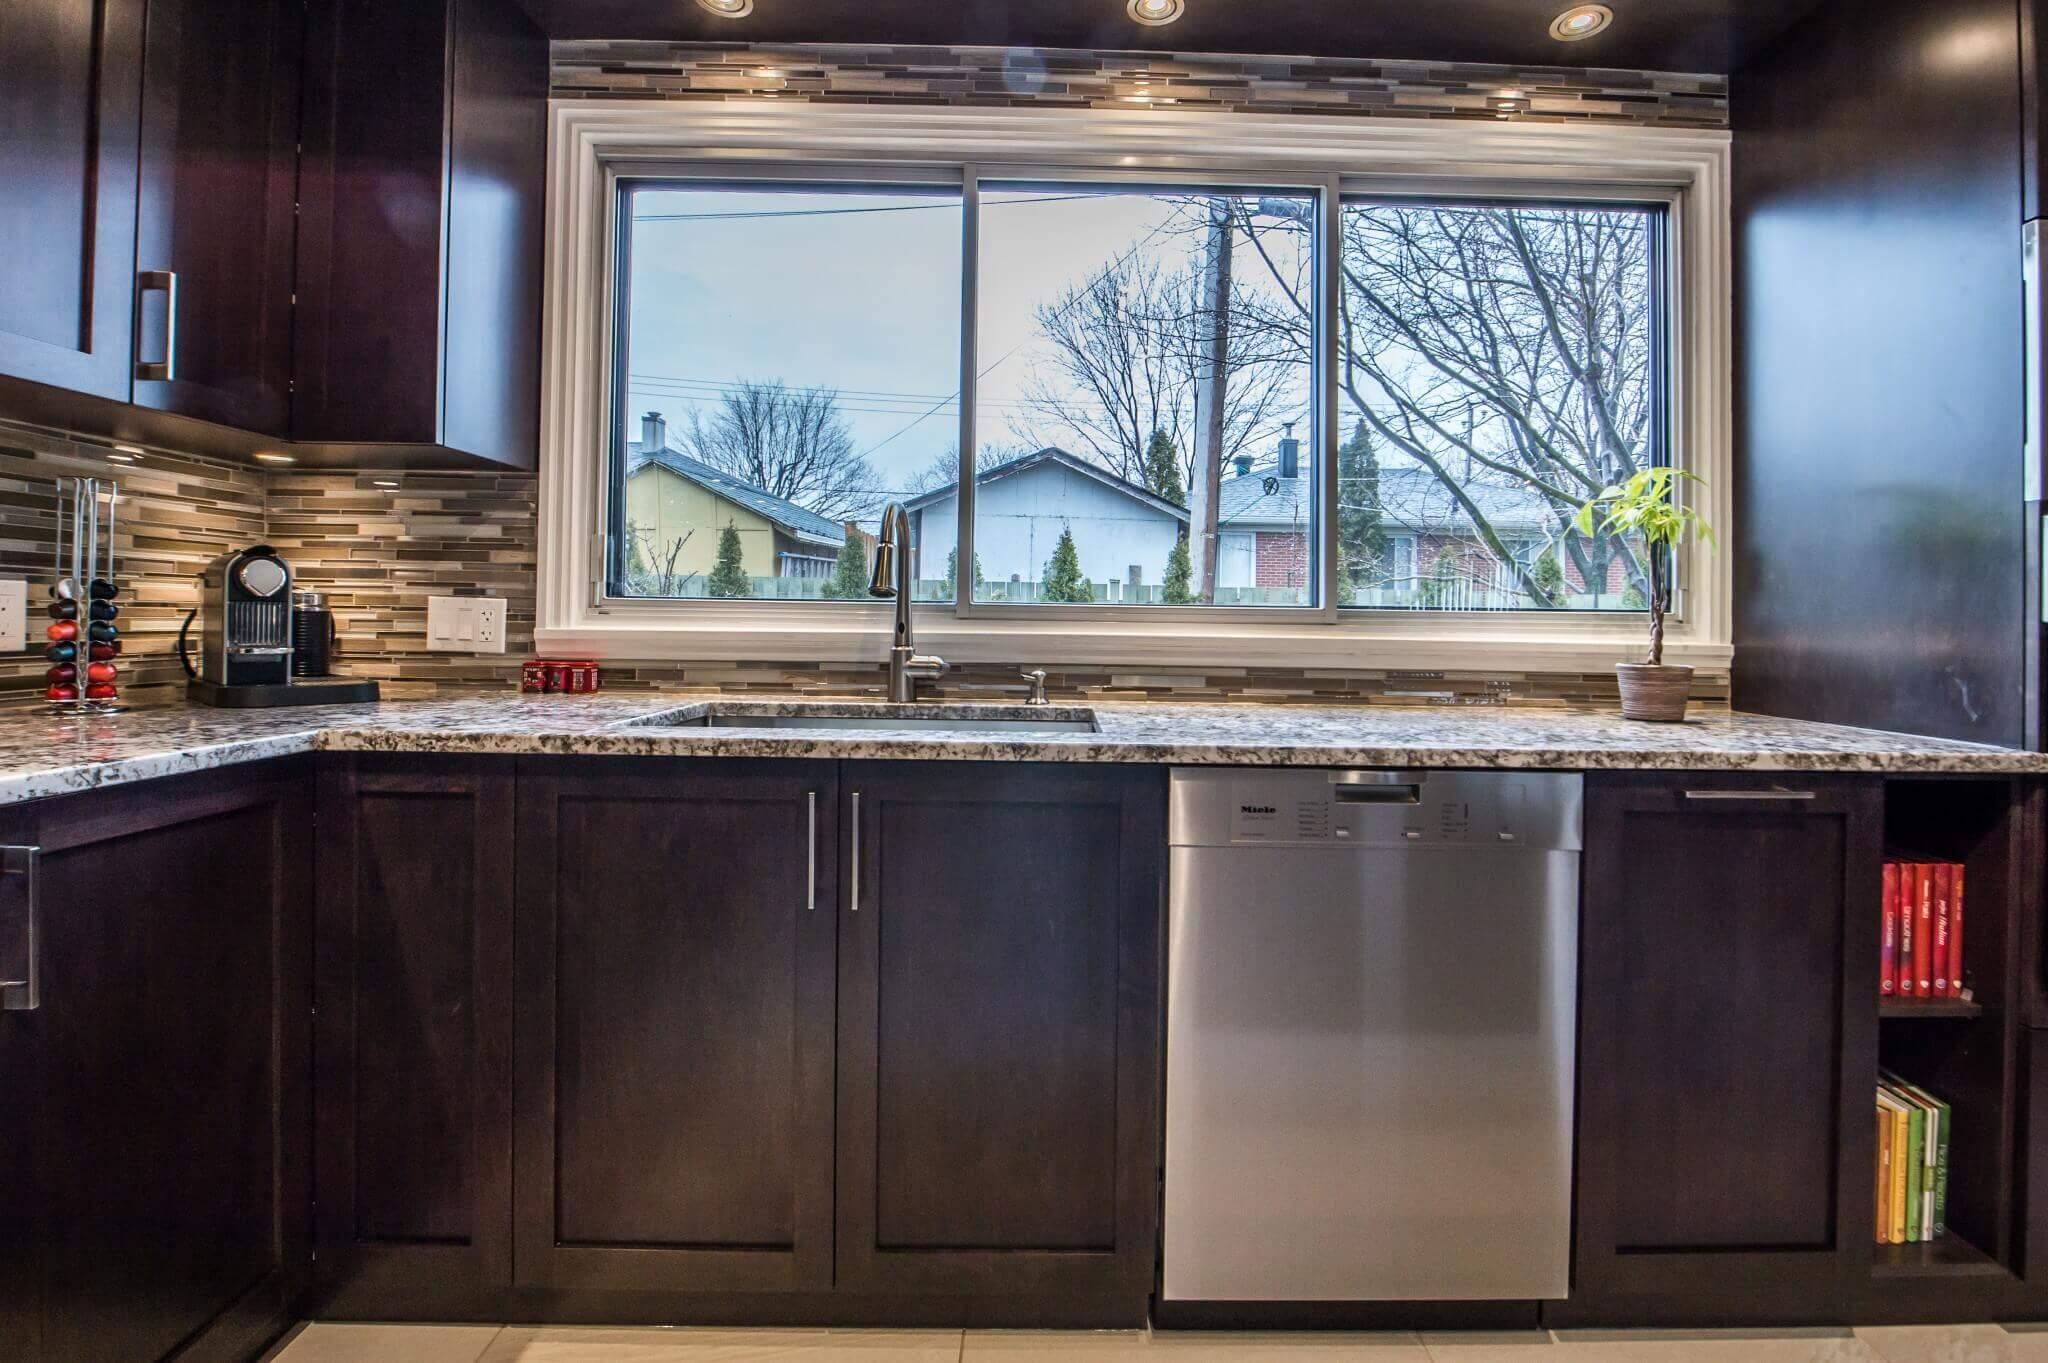 comptoir et armoires de cuisine grande fenetre